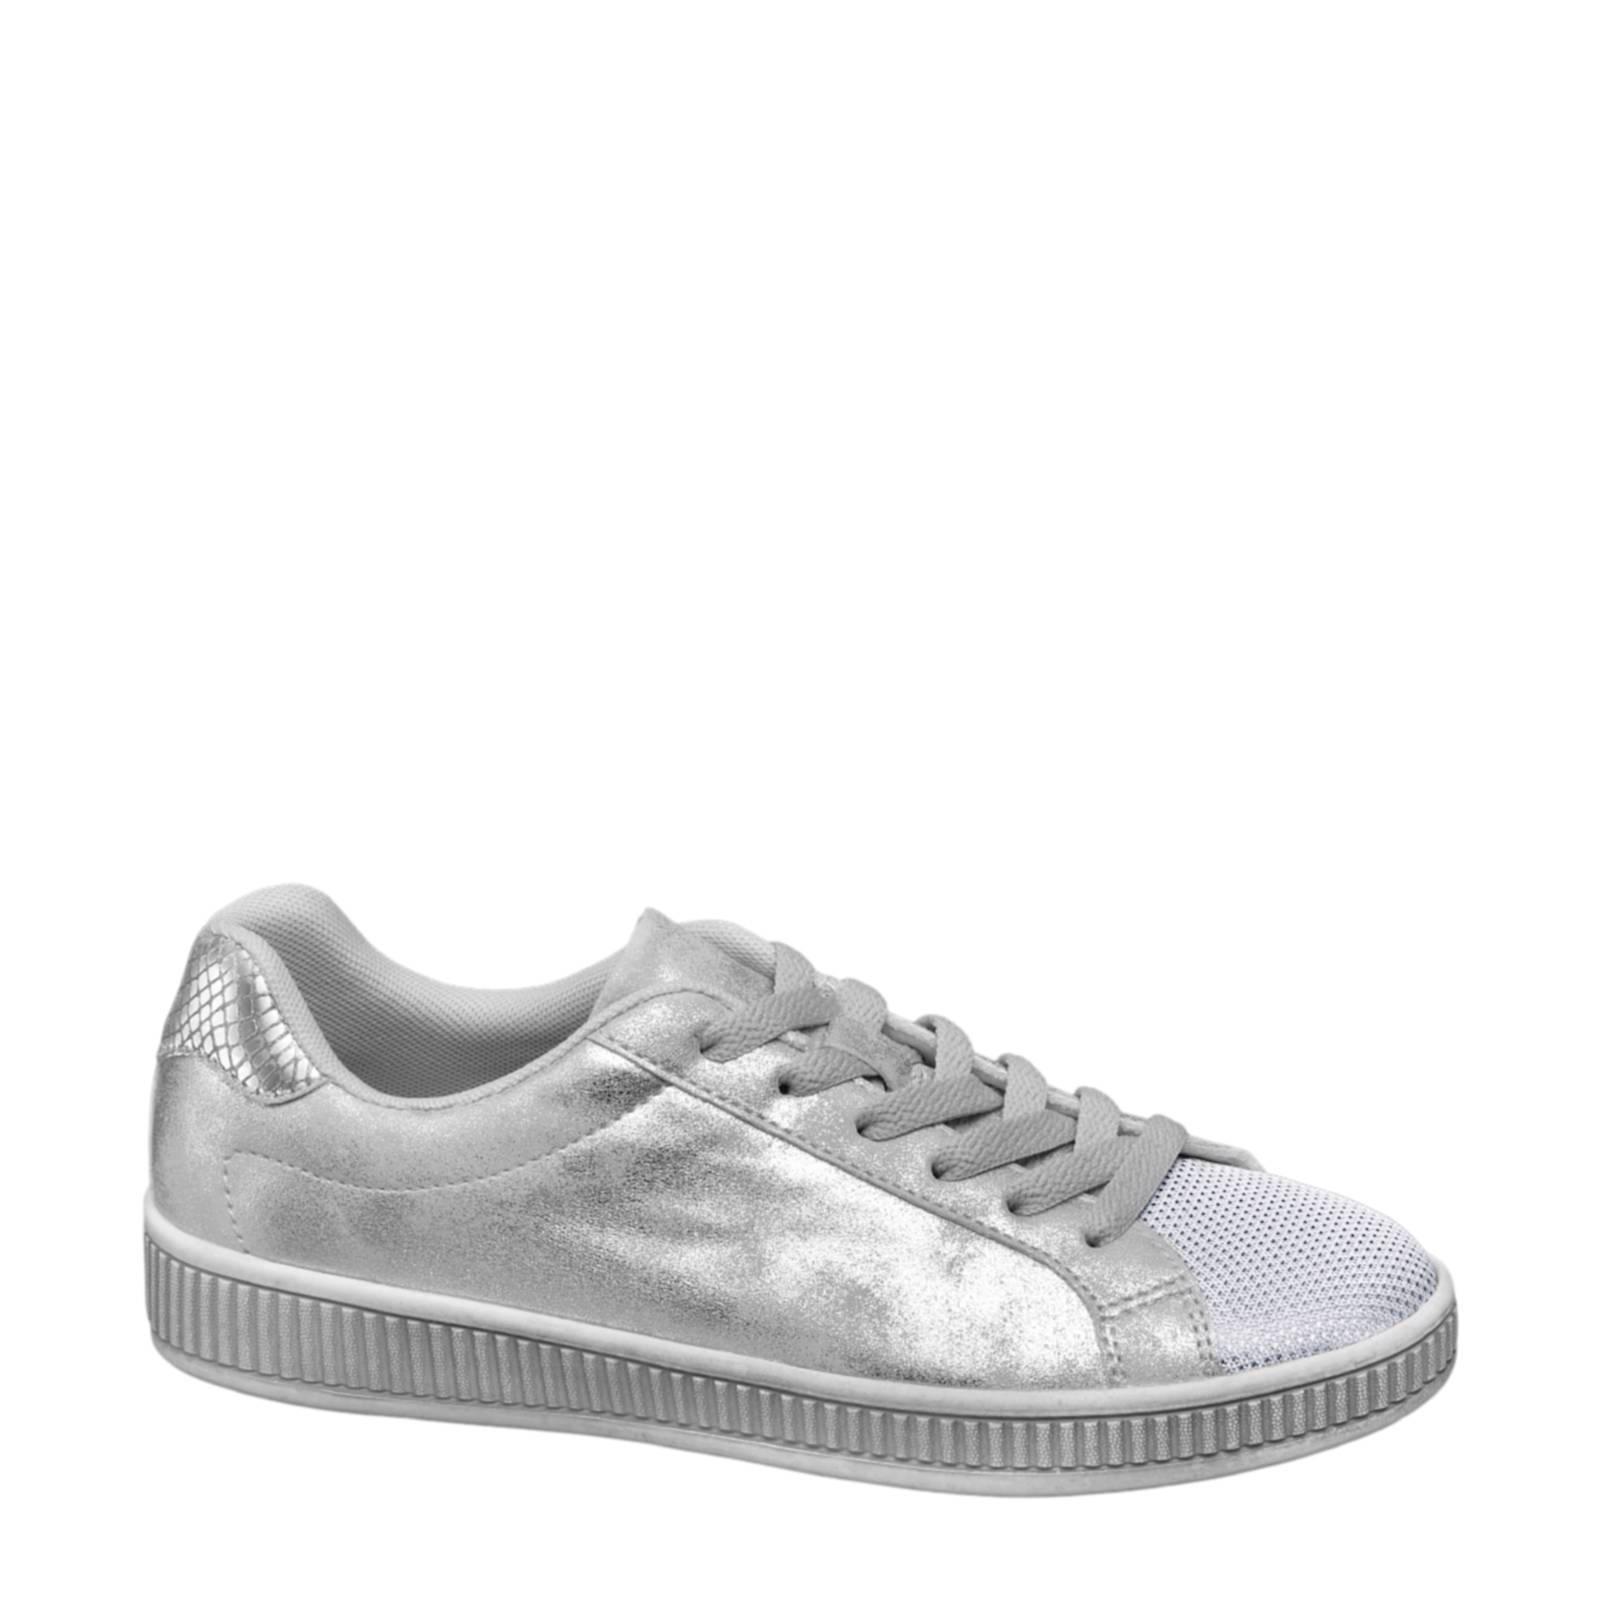 5ba8f4505df Graceland Metallic Vanharen Graceland Metallic Vanharen Sneakers Sneakers  Vanharen Graceland RR5pqwr